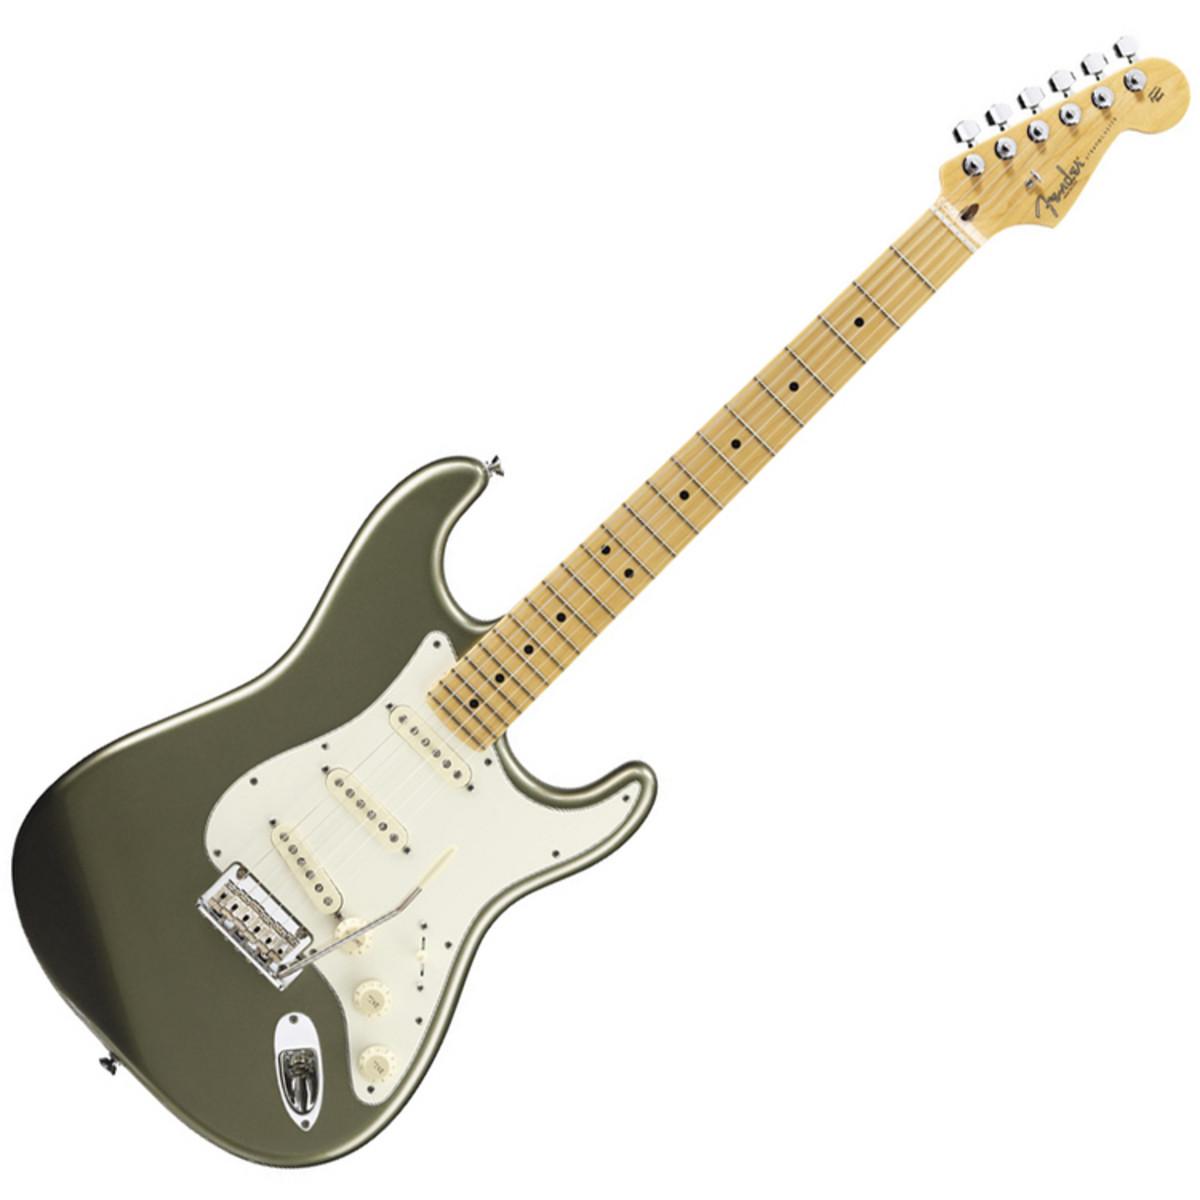 fender american standard stratocaster 2012 mn jade pearl metallic at. Black Bedroom Furniture Sets. Home Design Ideas